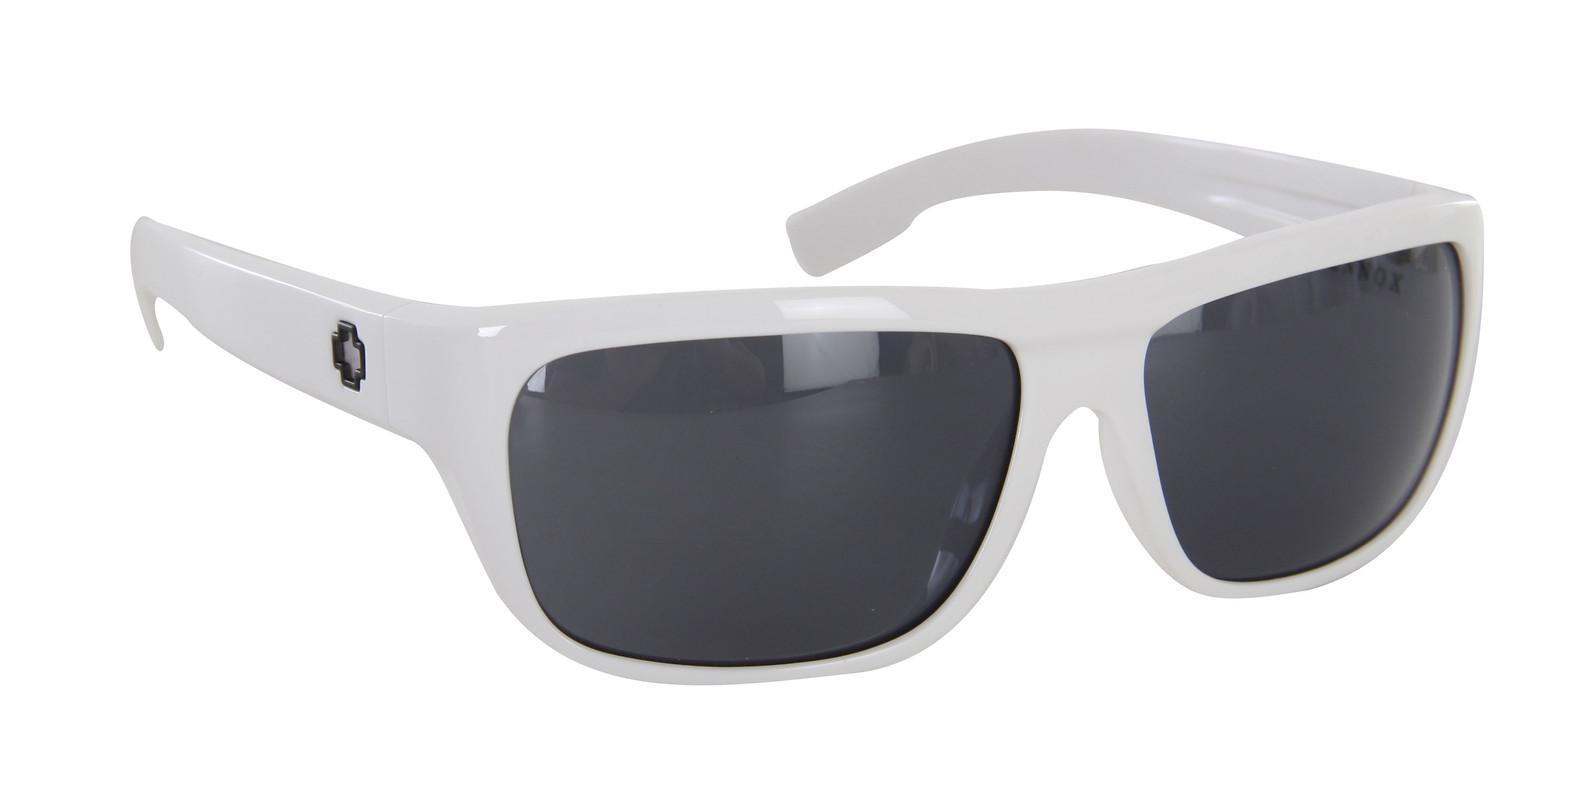 Spy Optic Spy Lennox Sunglasses White Grey Lens  spy-lennox-sngls-whtgry-10.jpg